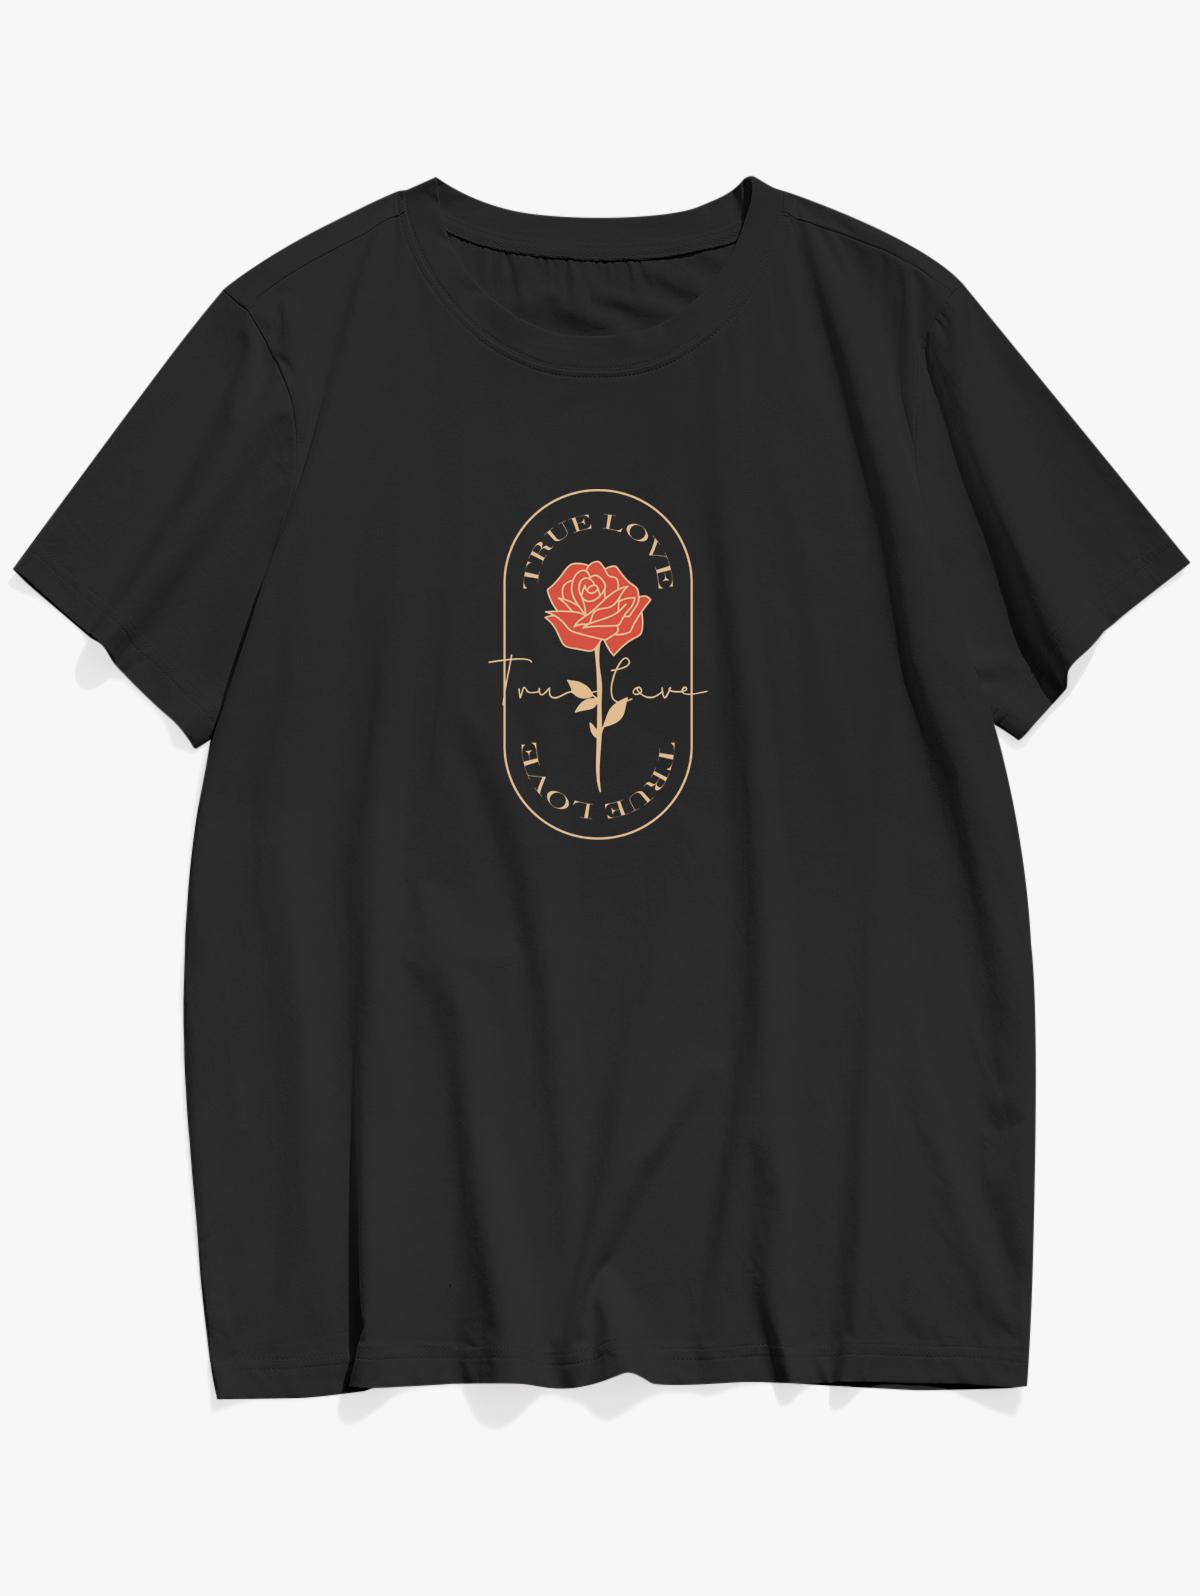 TRUE LOVE Rose Graphic Basic T-shirt, Black